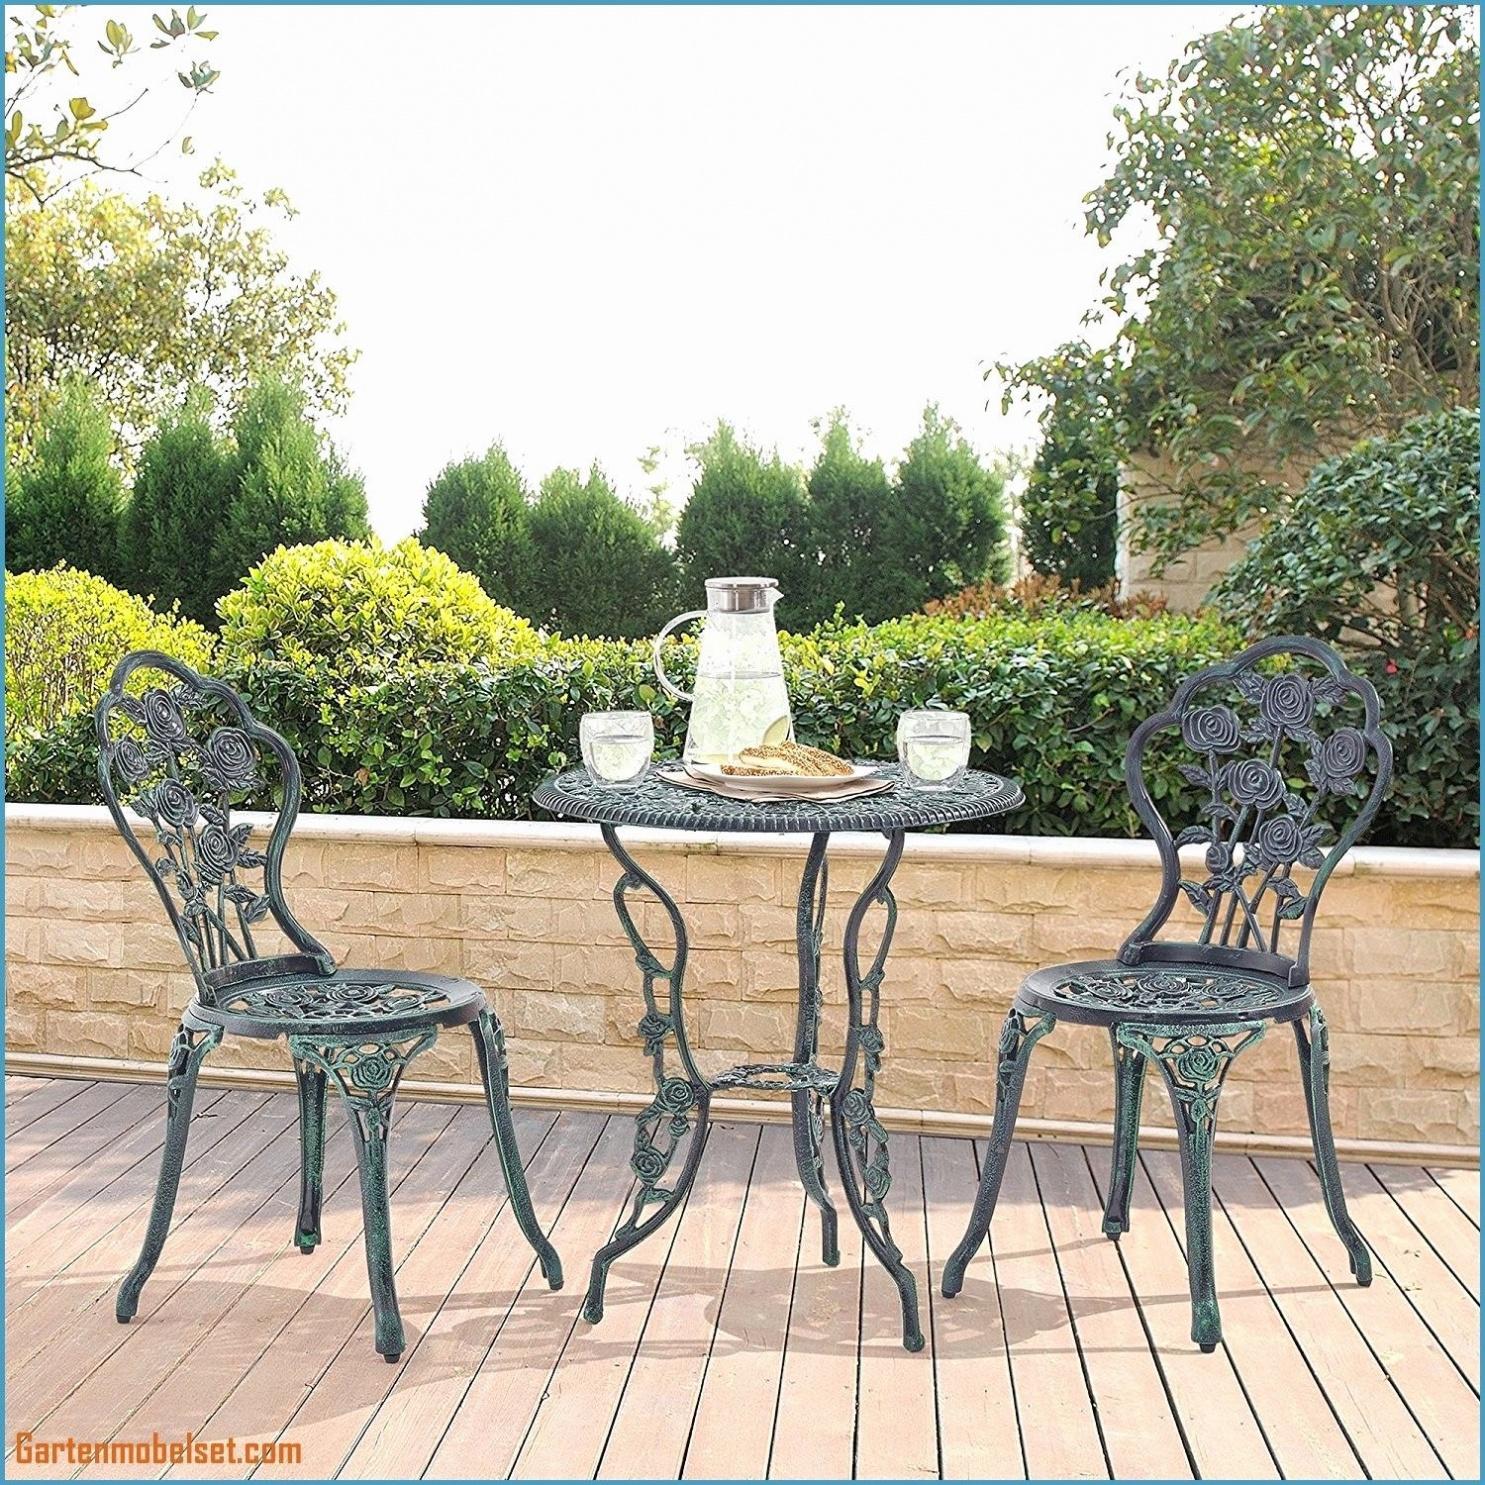 neu 40 jardin gartenmobel de muebles de jardin